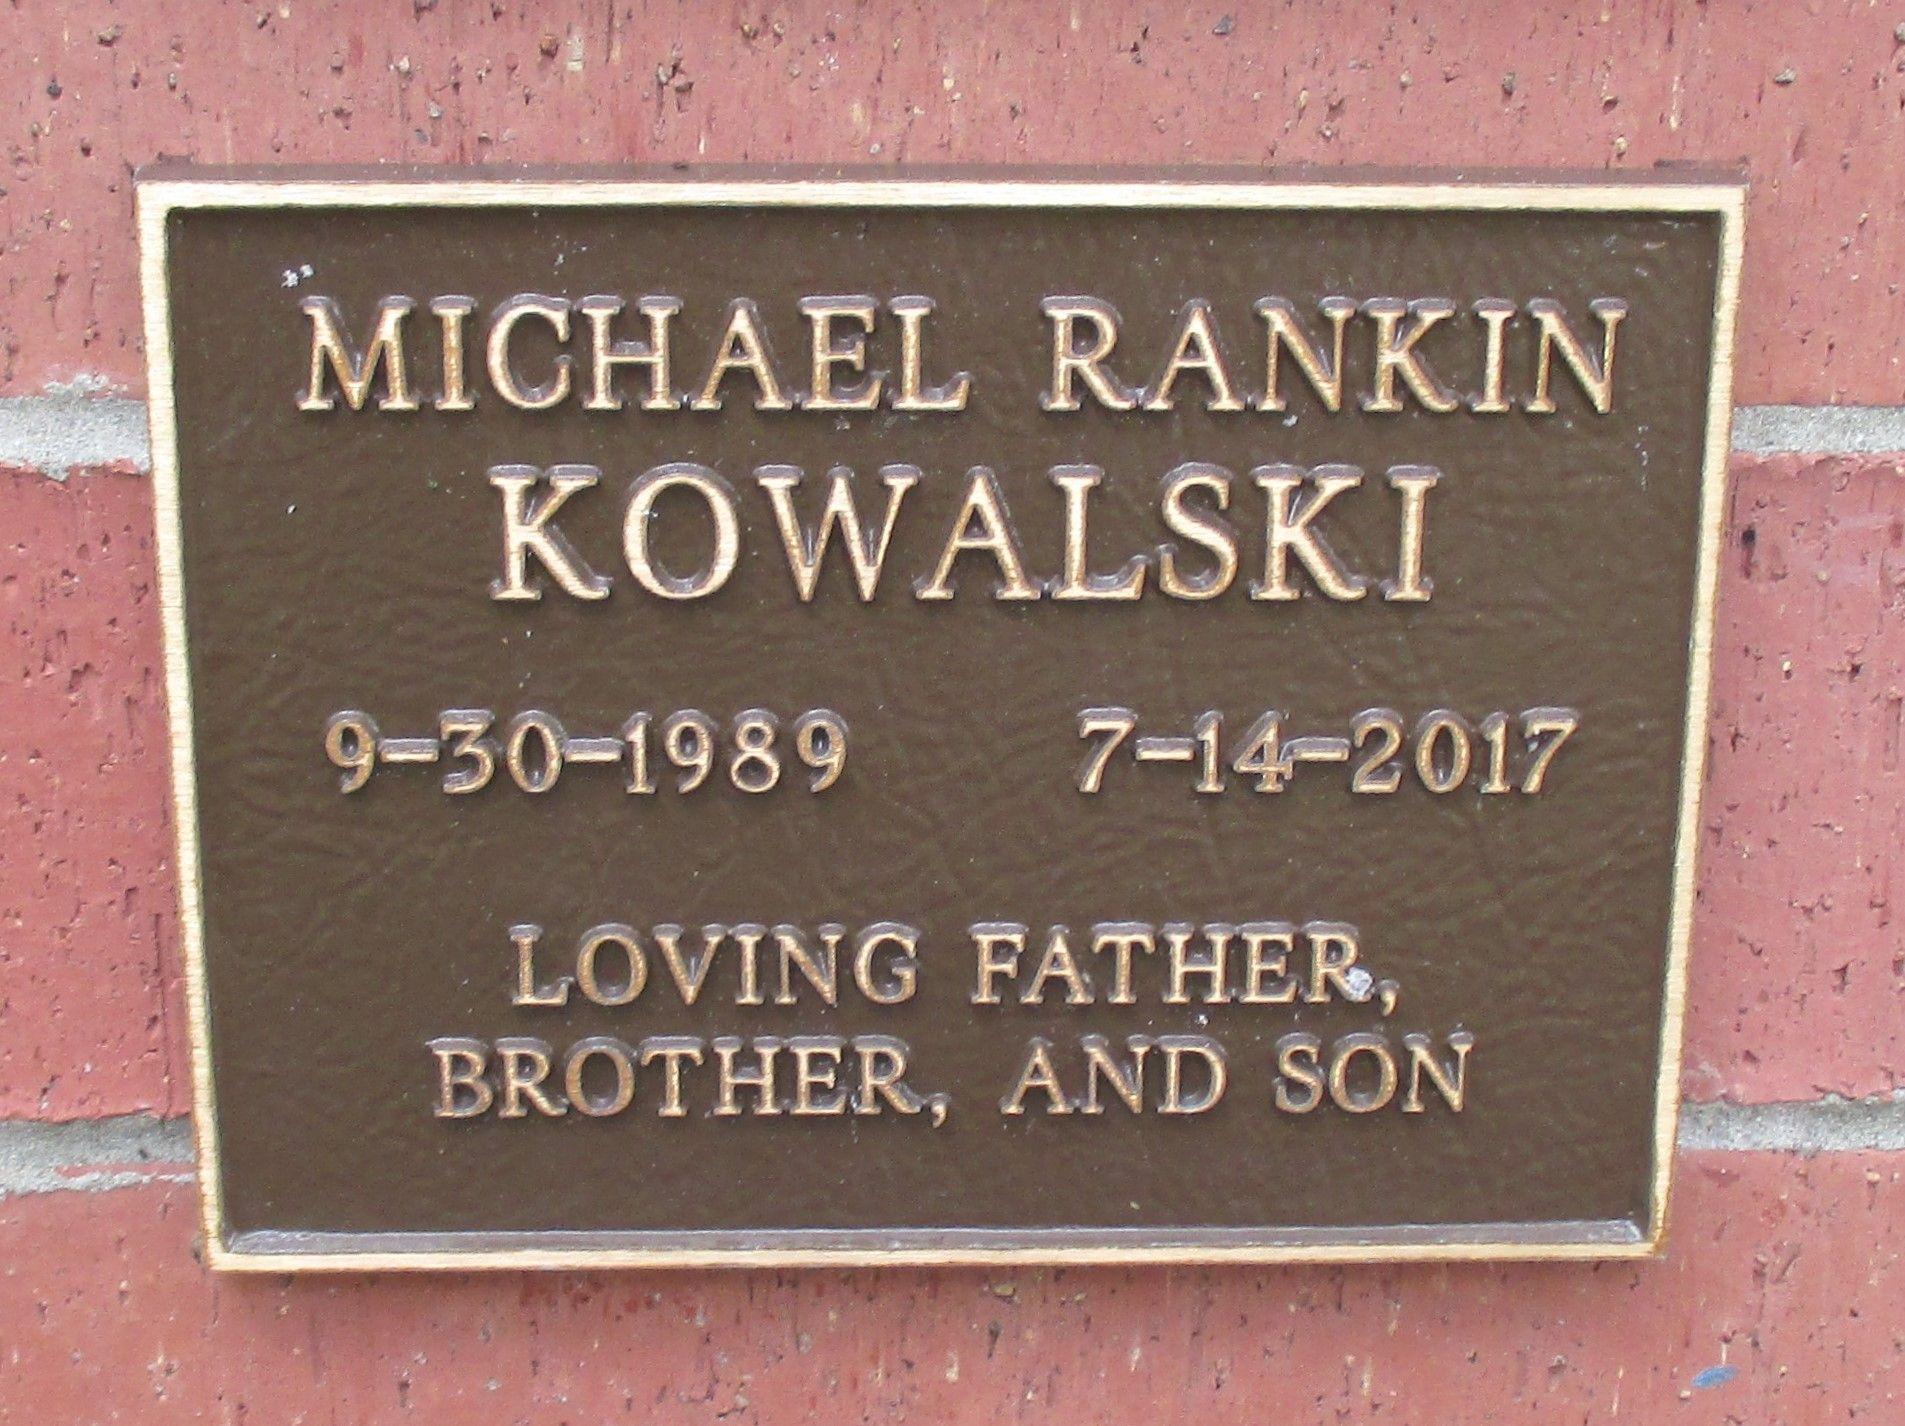 Michael Rankin Kowalski (1989-2017) - Find A Grave Memorial